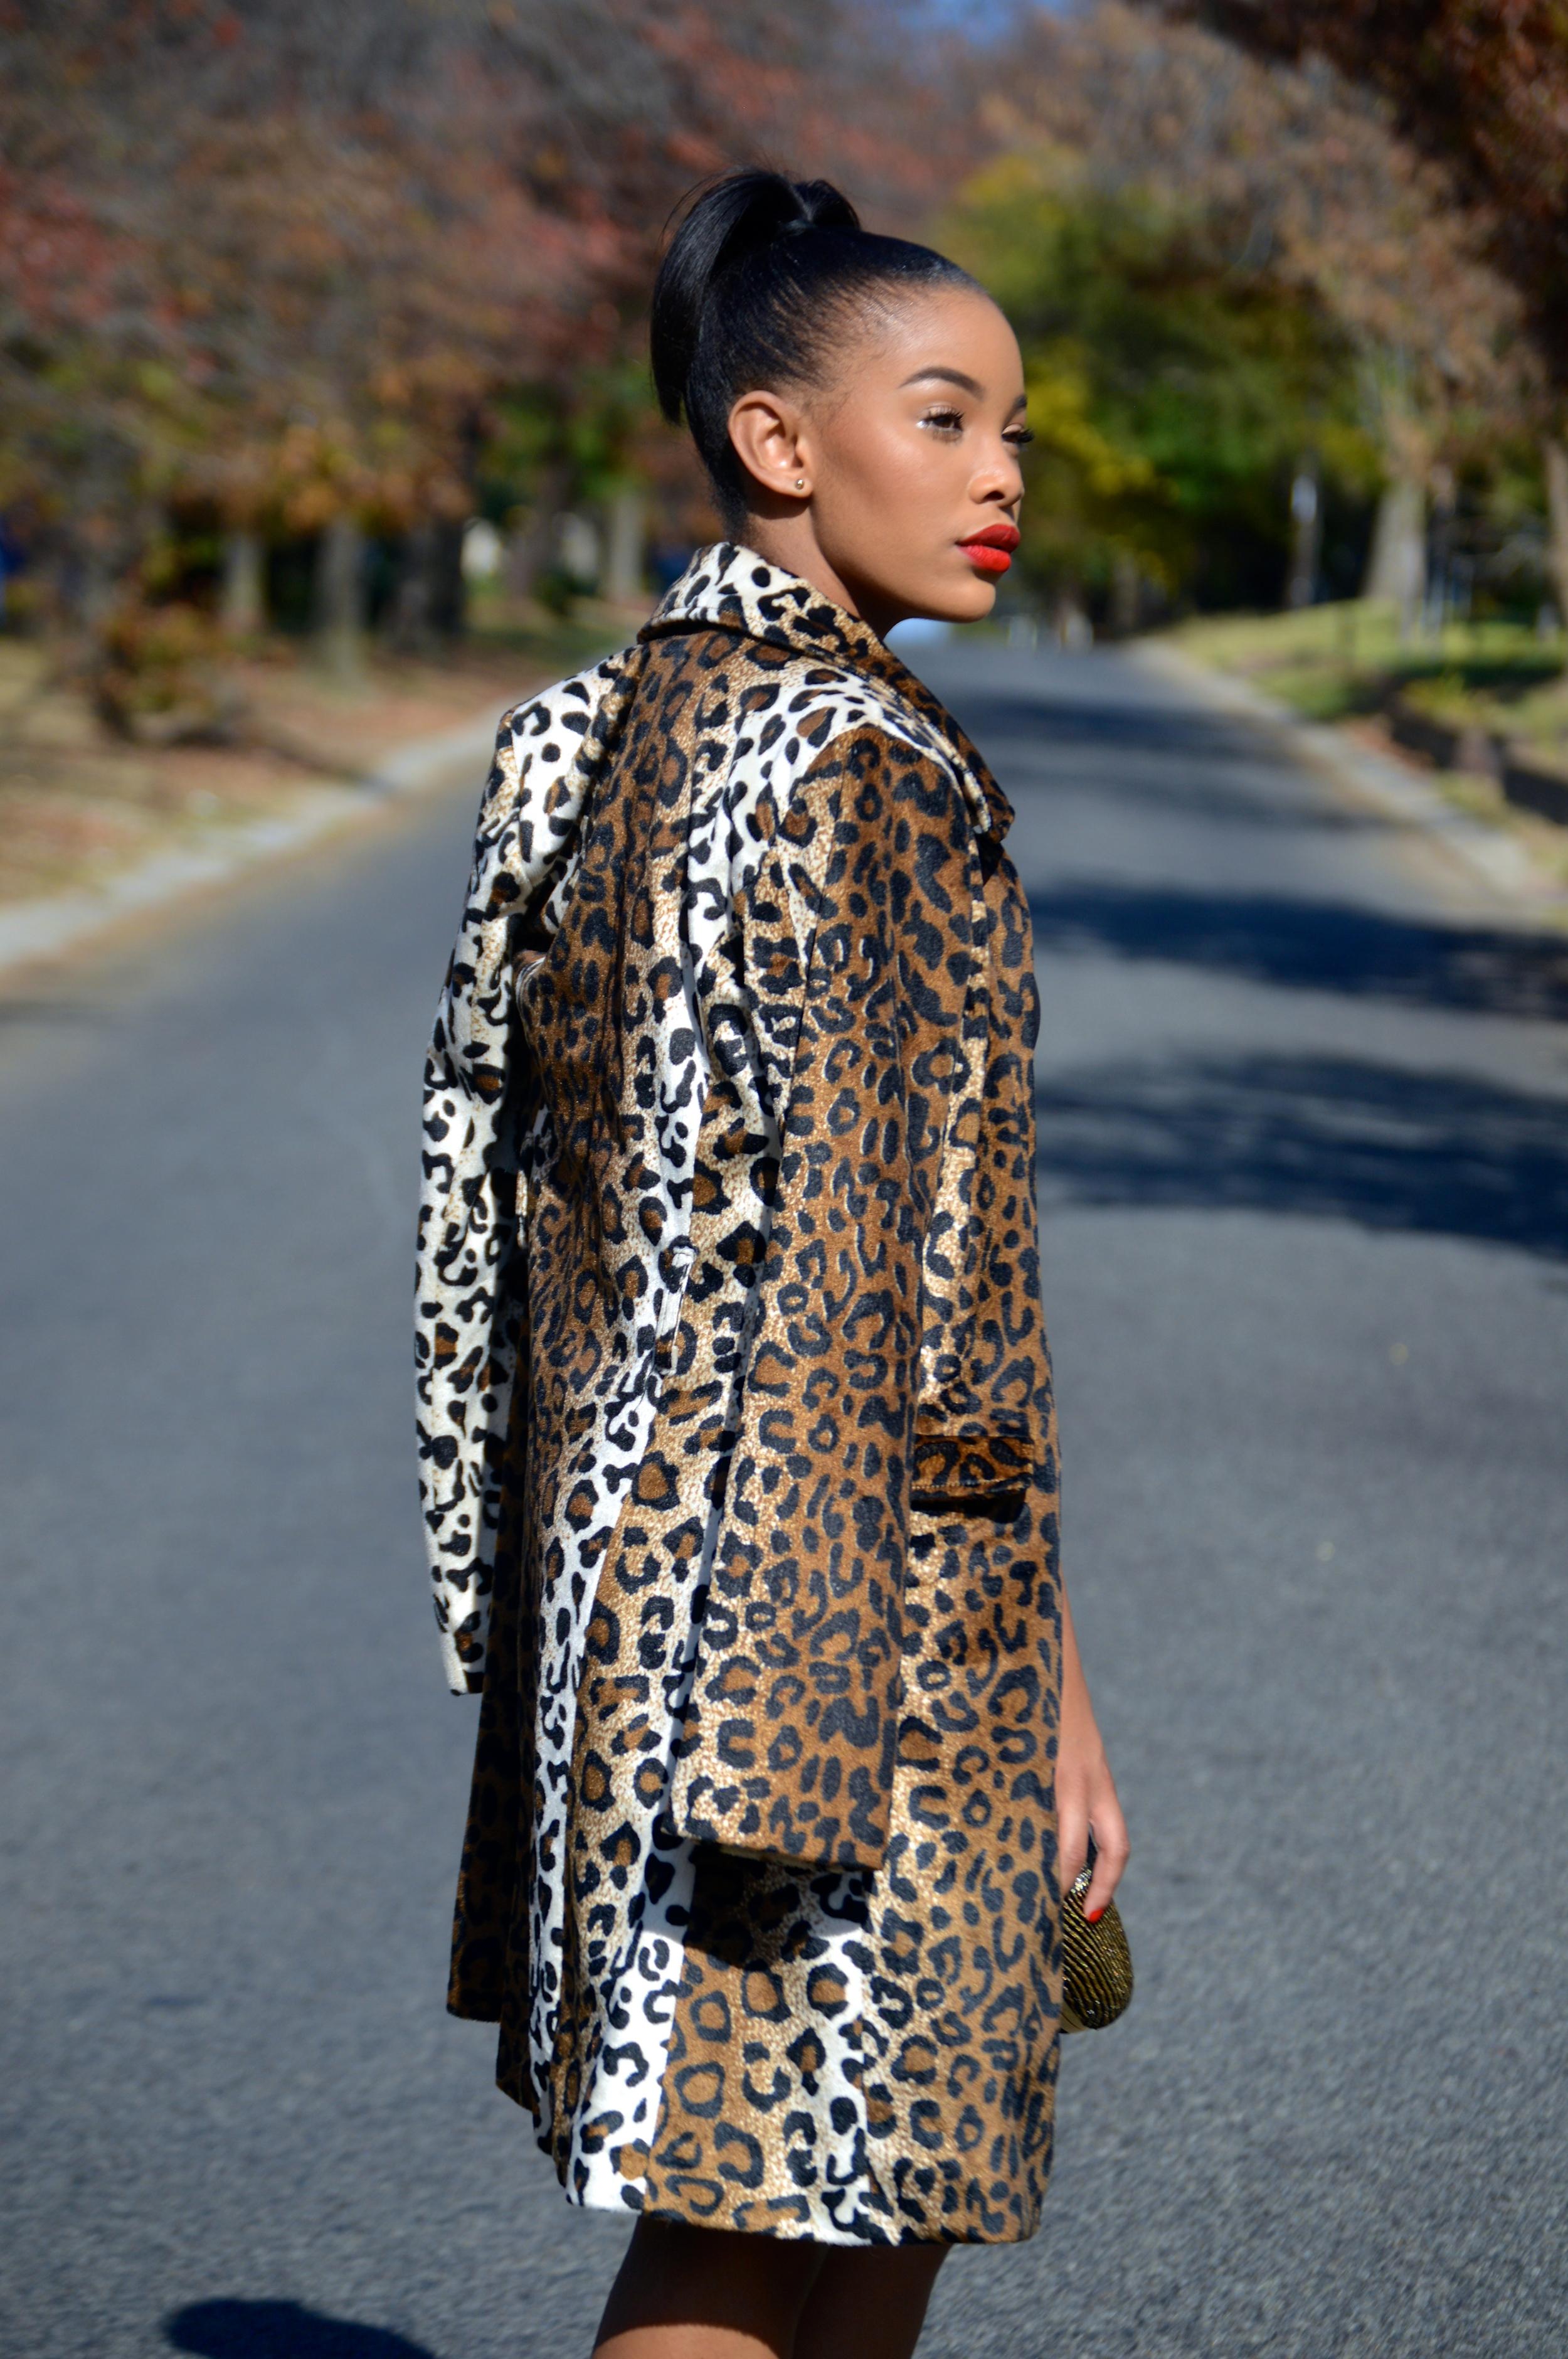 Kaylista_Leopard_10